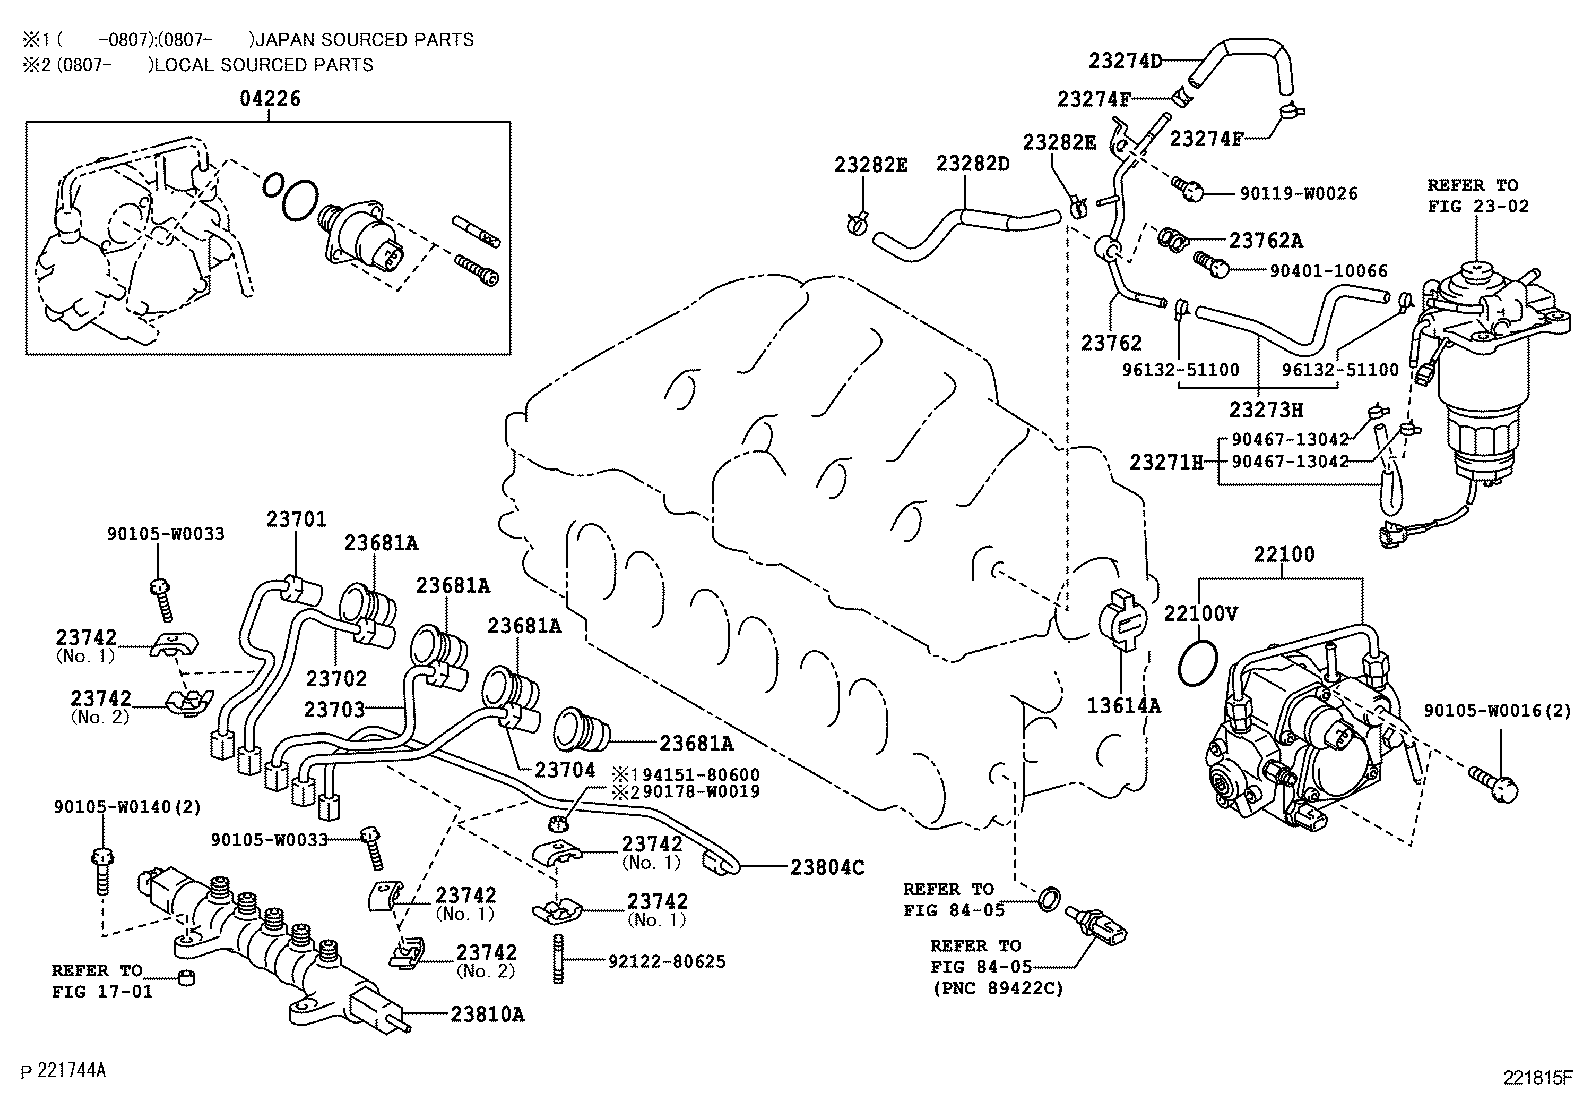 [DIAGRAM] Toyota Corolla Verso Engine Diagram FULL Version